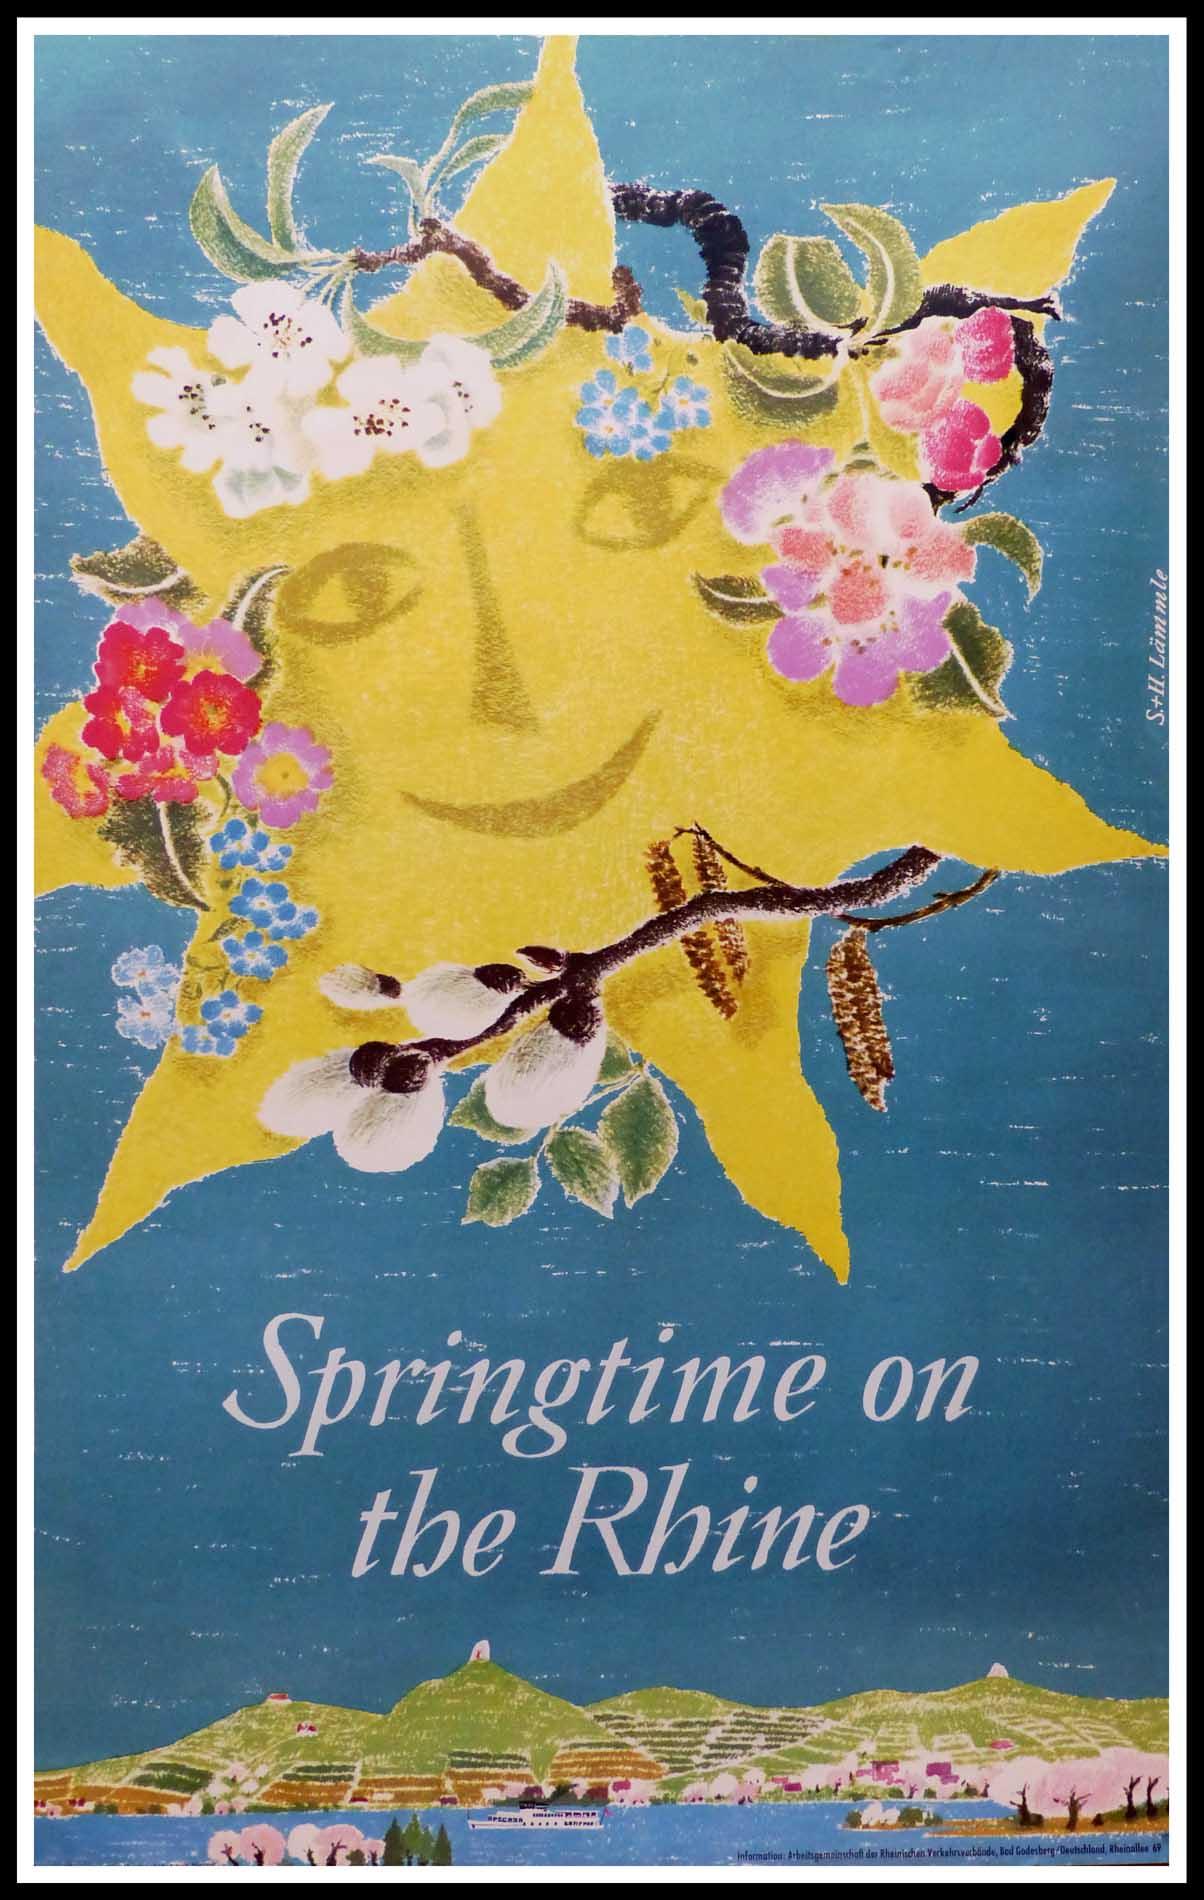 "(alt=""original vintage travel poster, springtime in the Rhine, signed in the plate S. H. LÄMMLE, printed by Druck A. Bagel, Düsseldorf, 1969"")"